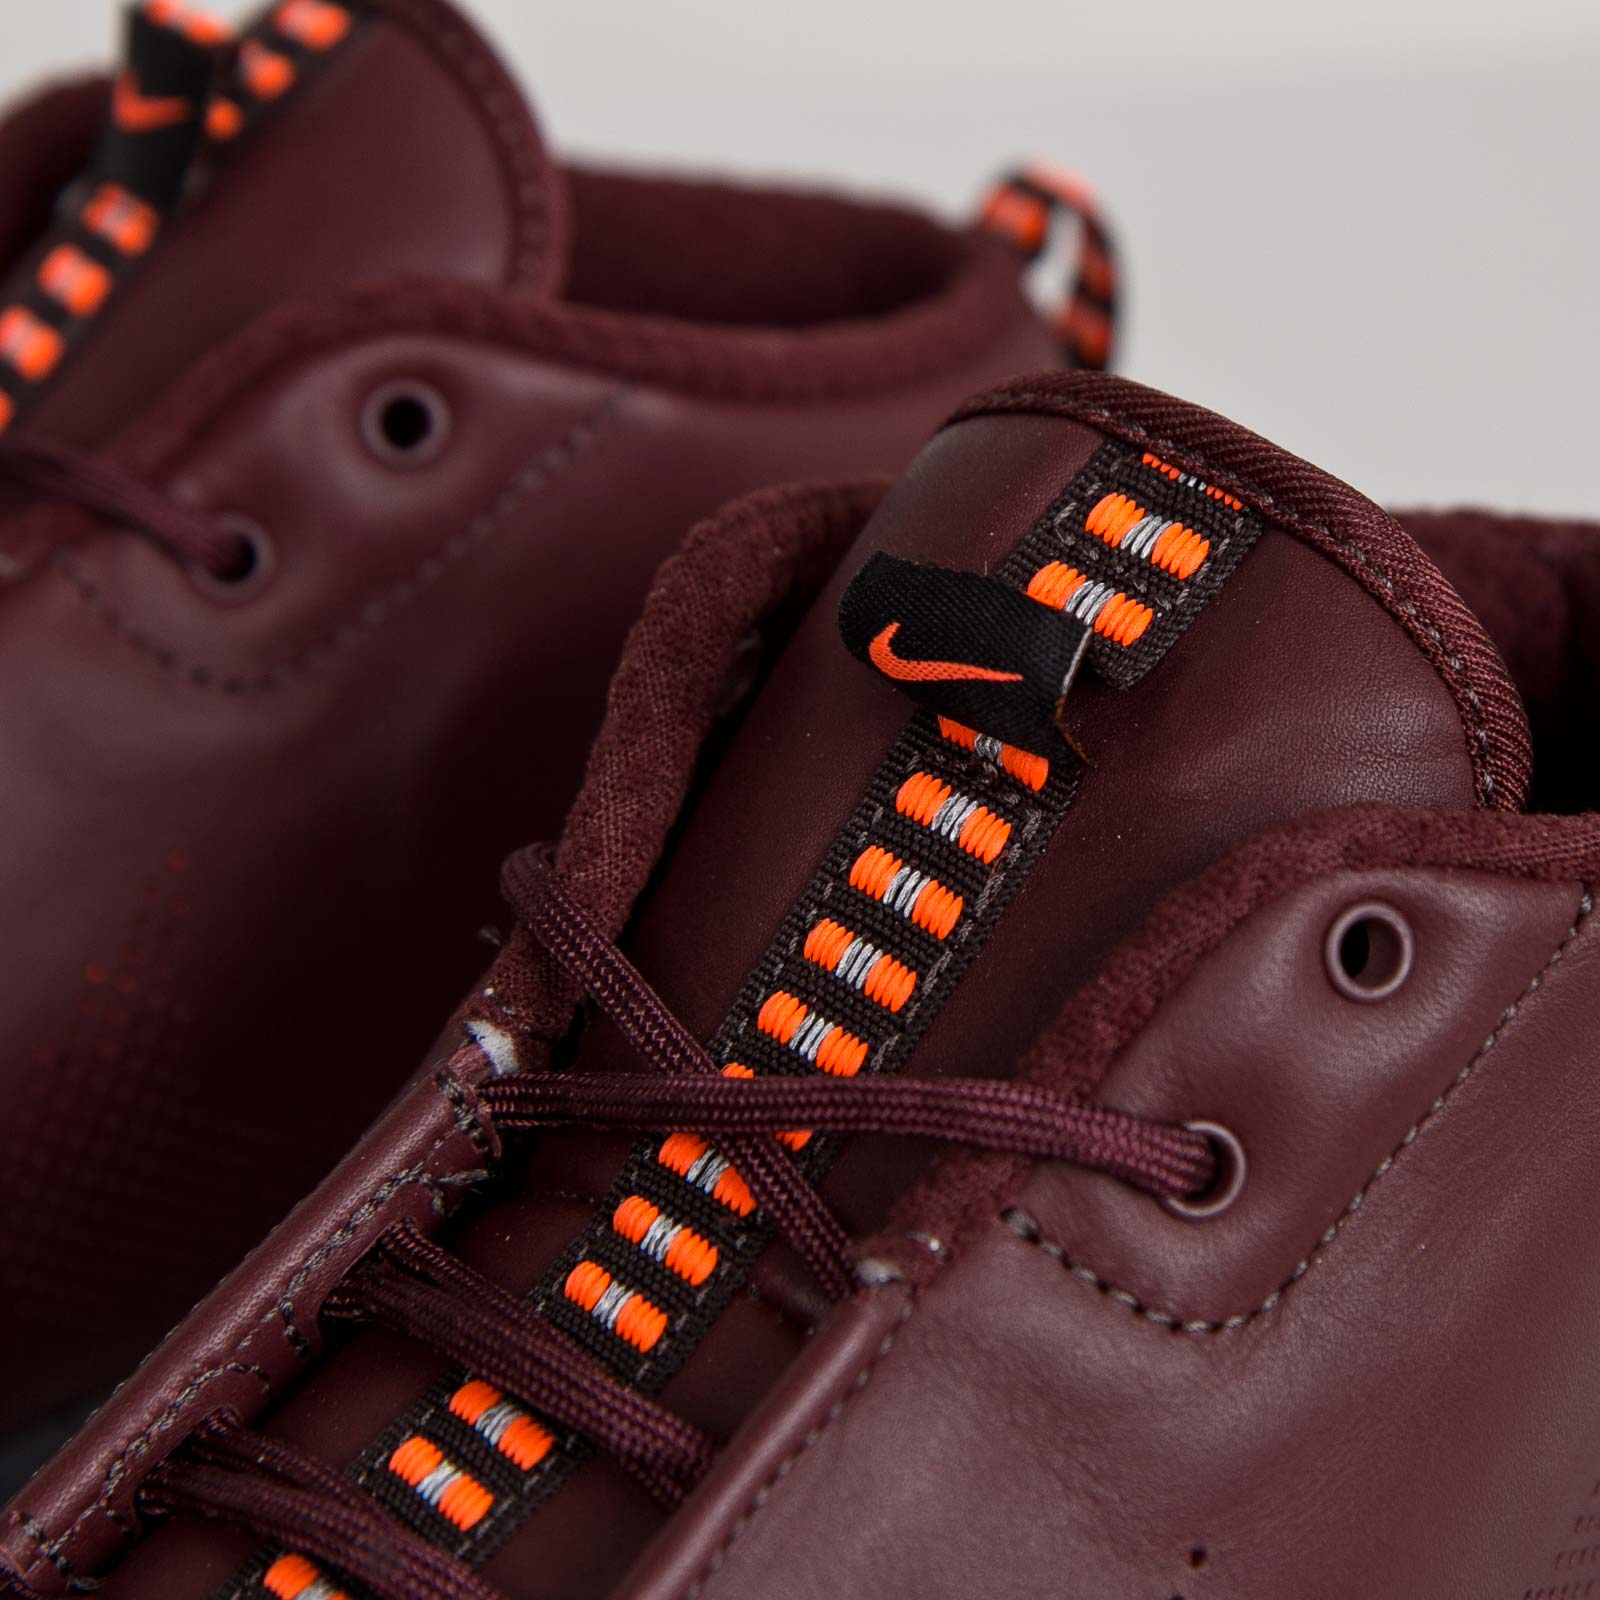 0340309120b1 Nike Roshe Run NM Sneakerboot Premium - 684704-200 - Sneakersnstuff ...